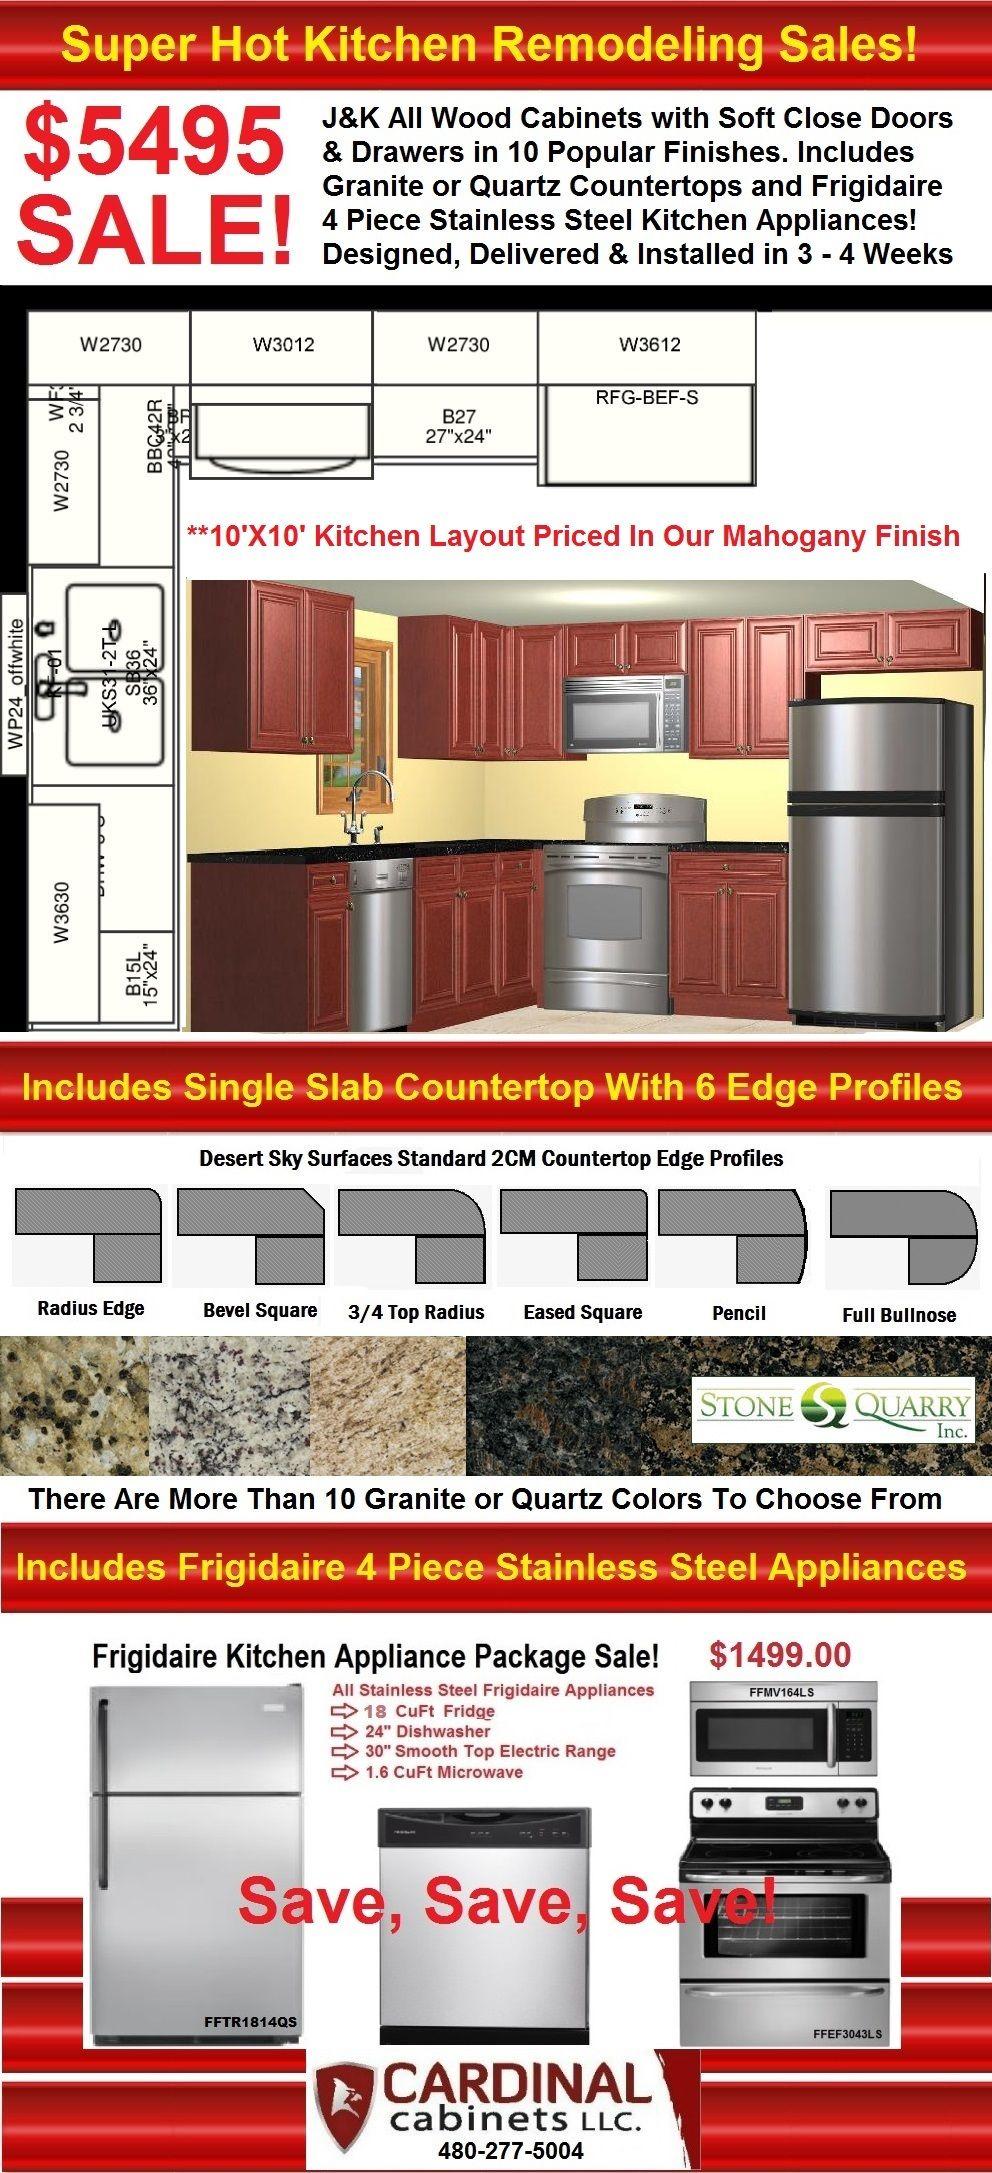 Mahogany Kitchen Cabinets Countertops Appliances Sale 5495 Mesa G Kitchen Cabinets And Countertops Cabinets And Countertops Stainless Steel Kitchen Appliances